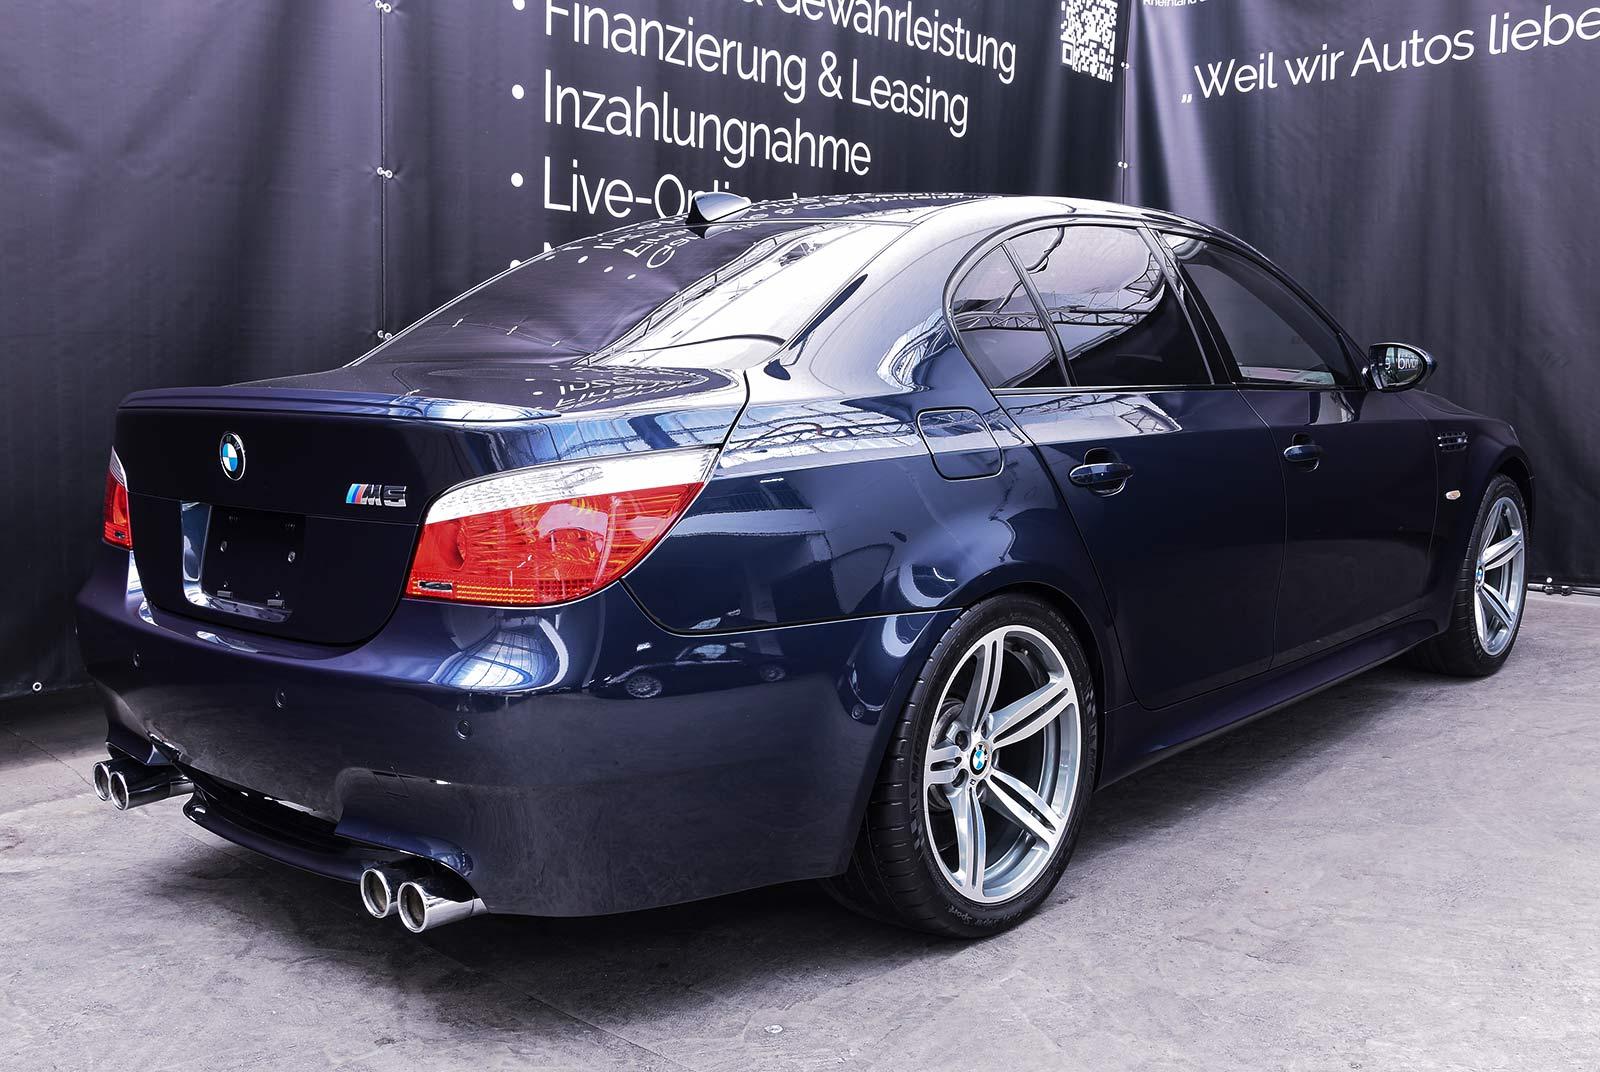 bmw_m_5_blaulila_creme_BMW-2353_02